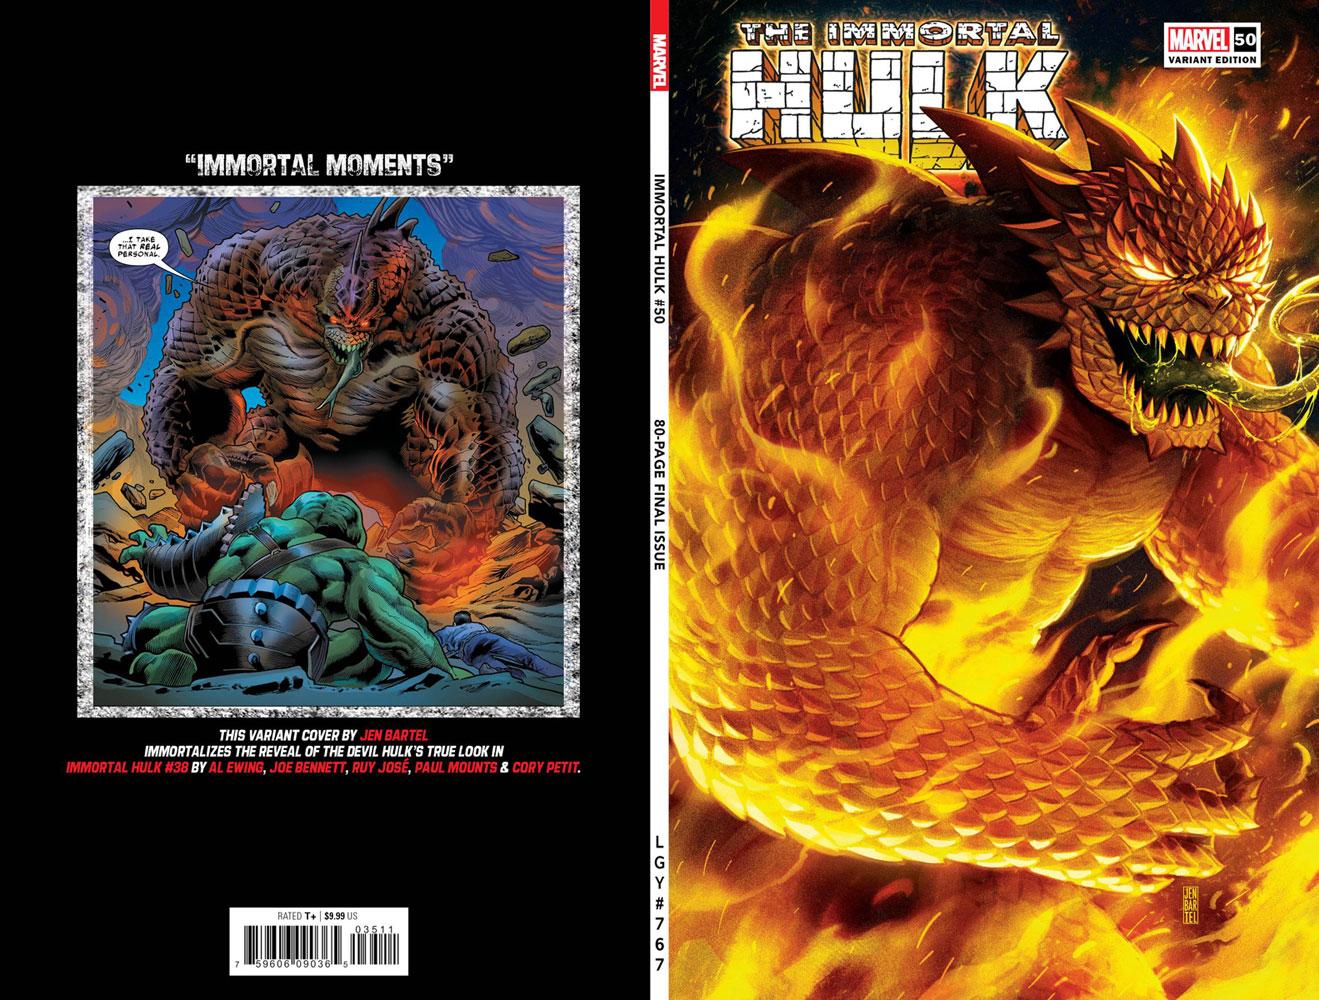 Immortal Hulk #50 (variant cover - Bartel)  [2021] - Marvel Comics